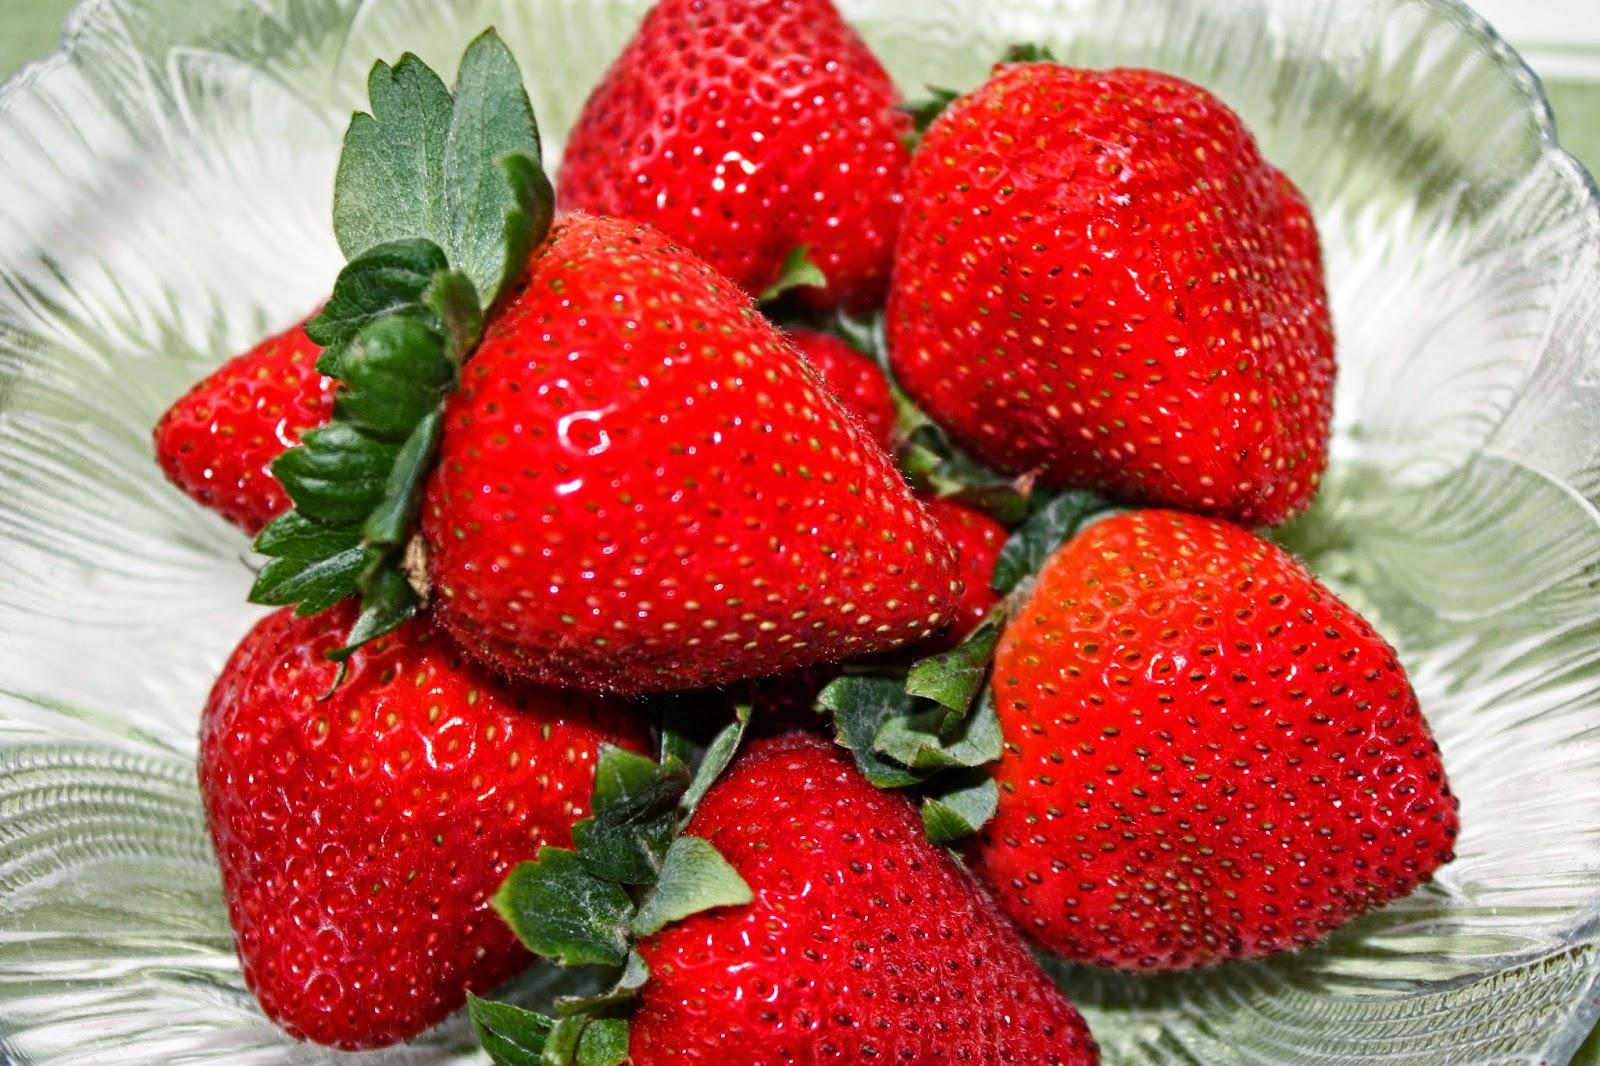 todomundopeques dieta salud sana fruta